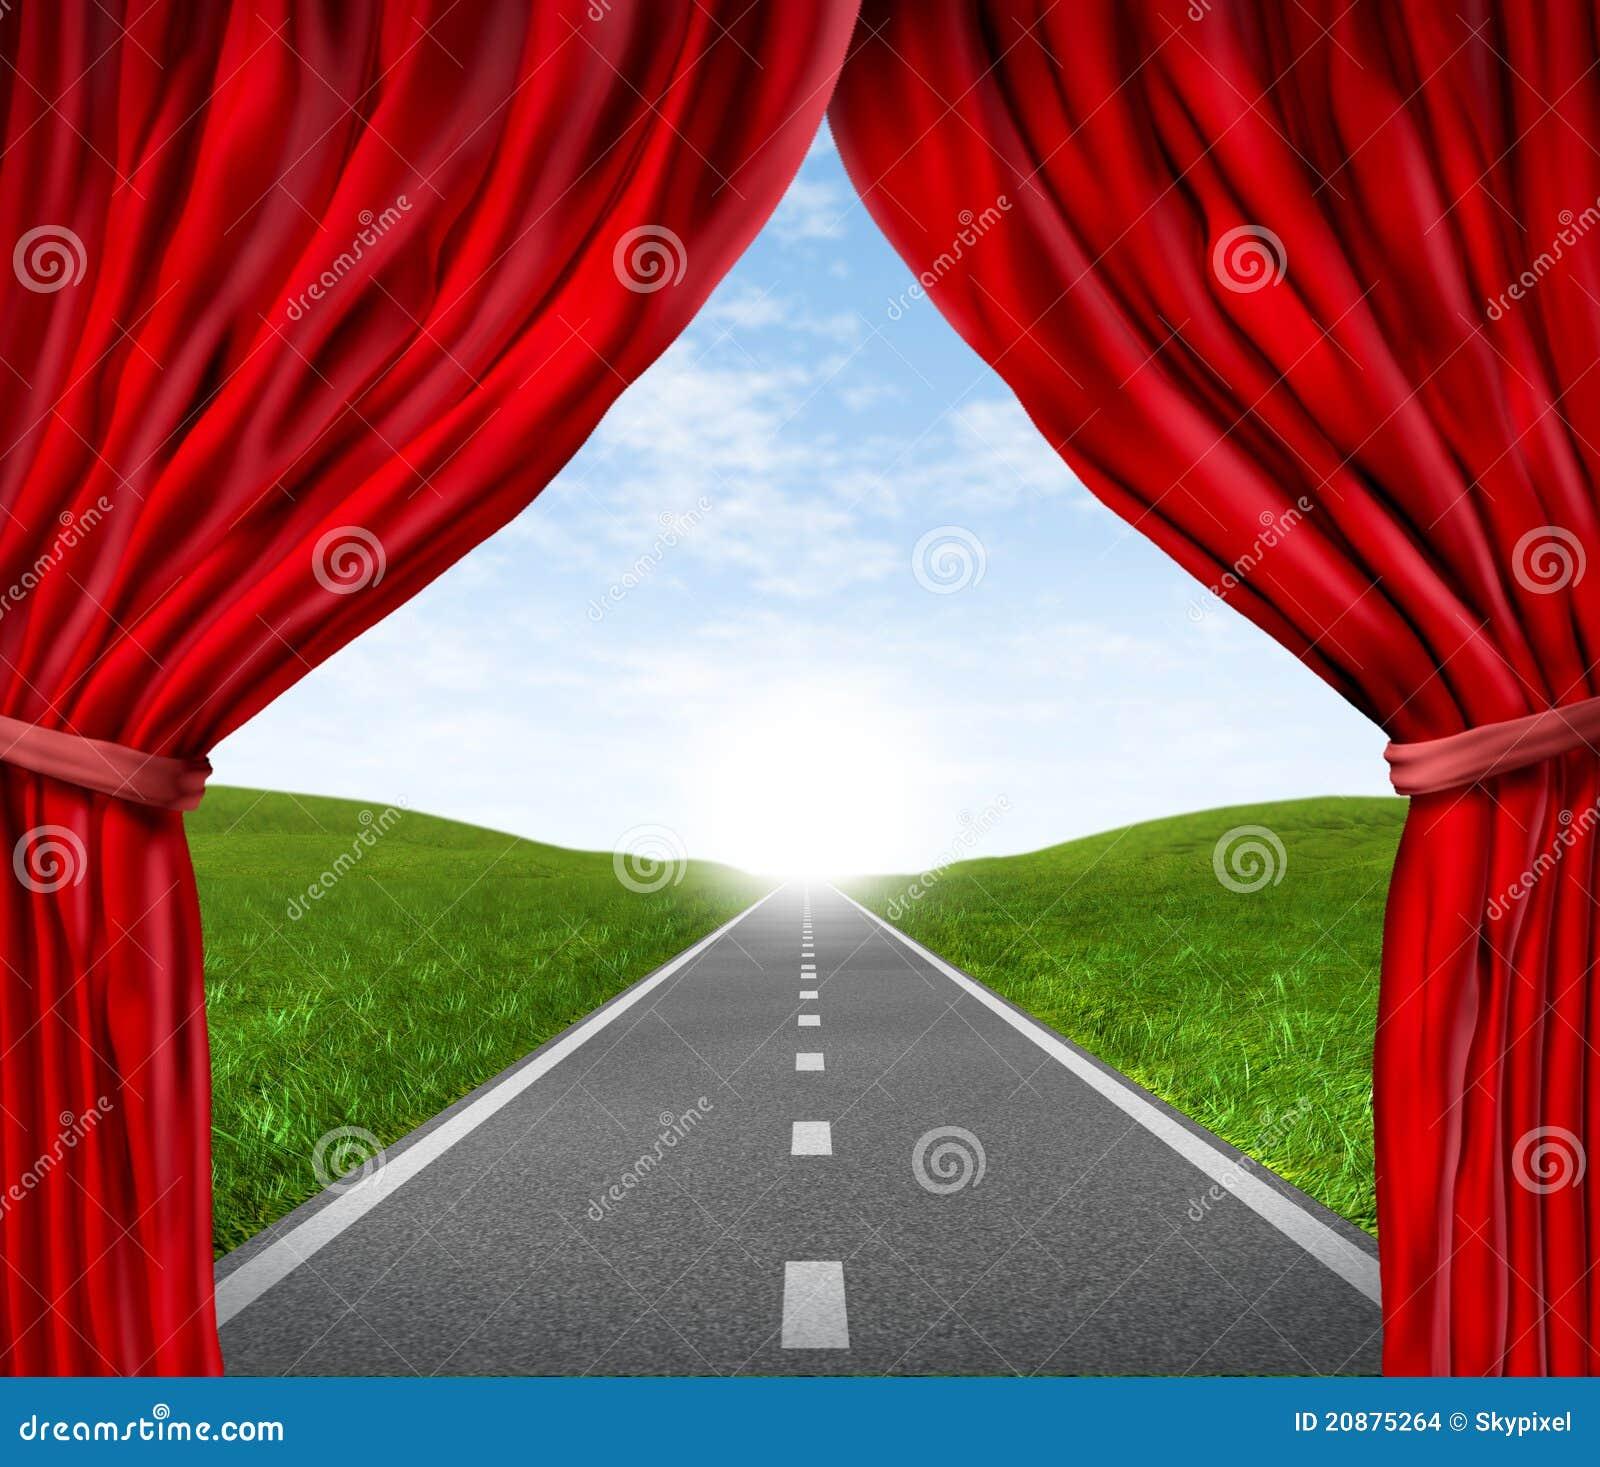 Velvet Curtains Png Clipart (#2448718) - PinClipart